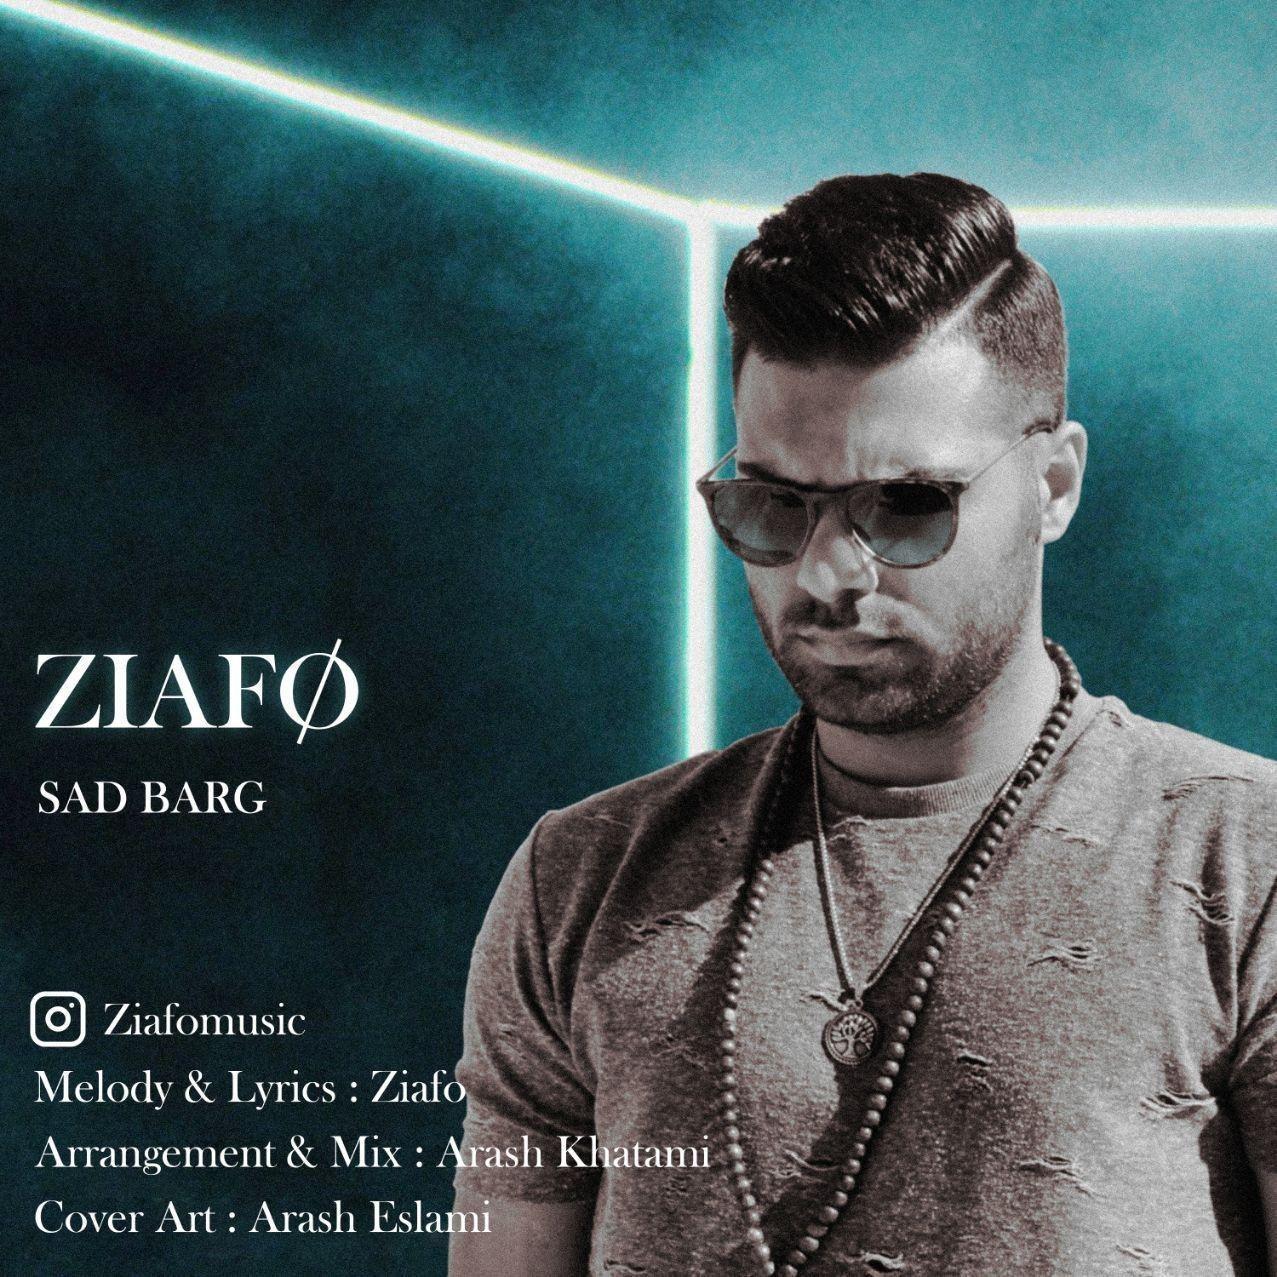 Ziafo – Sad Barg